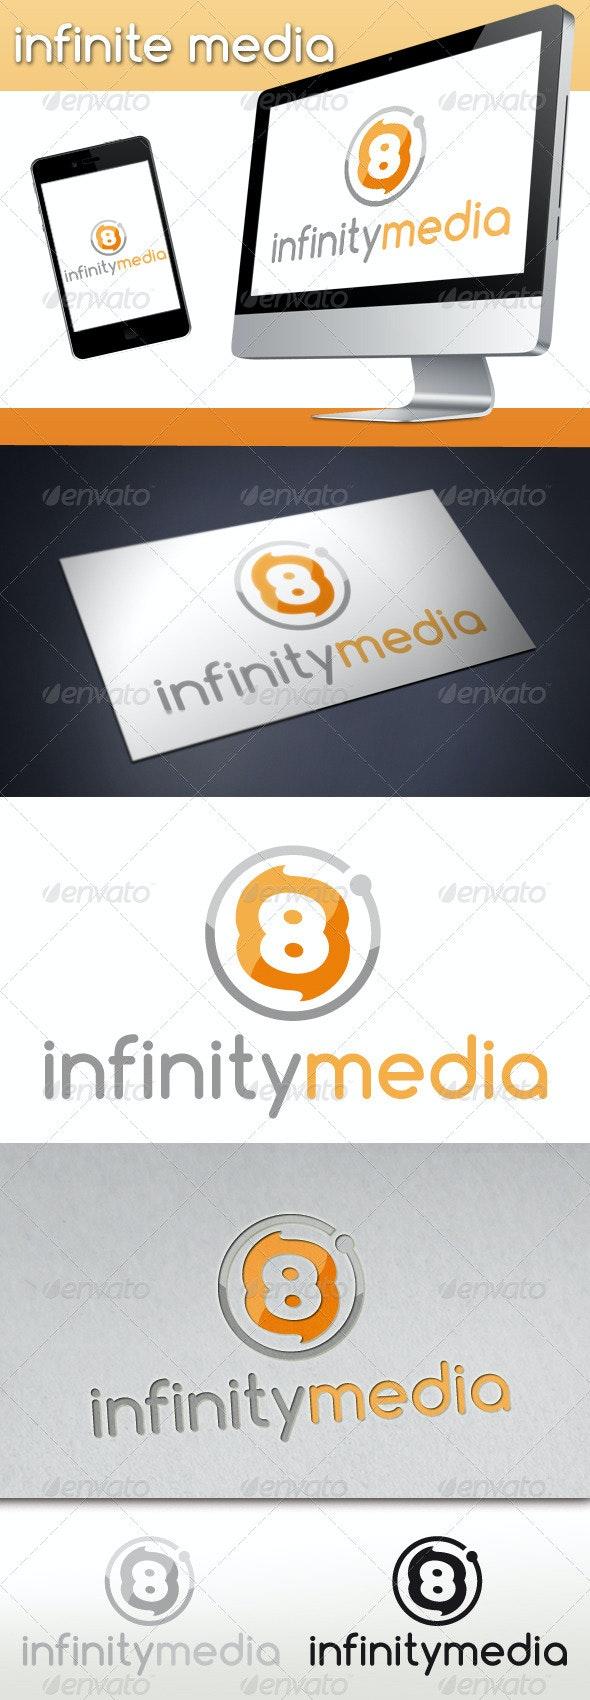 26 Best Number Logos  for February 2019